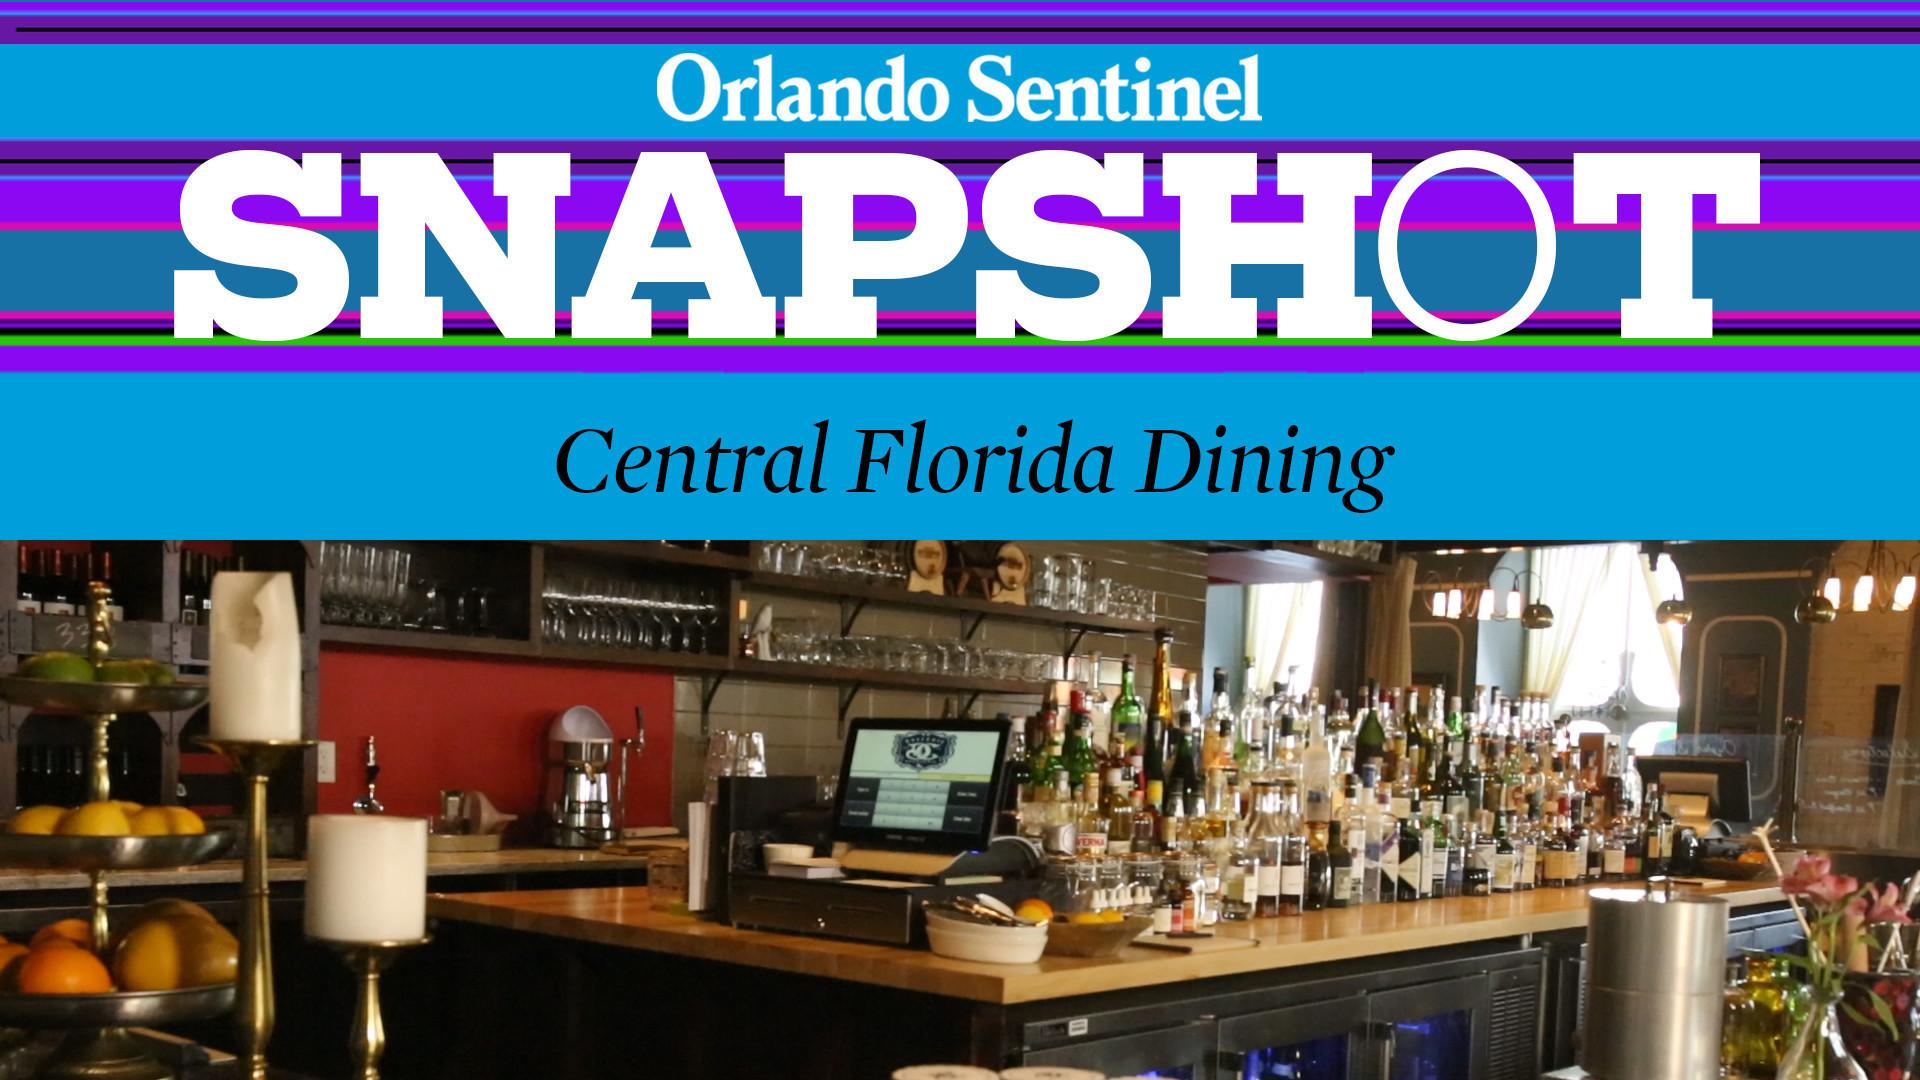 Orlando sentinel coupons for restaurants